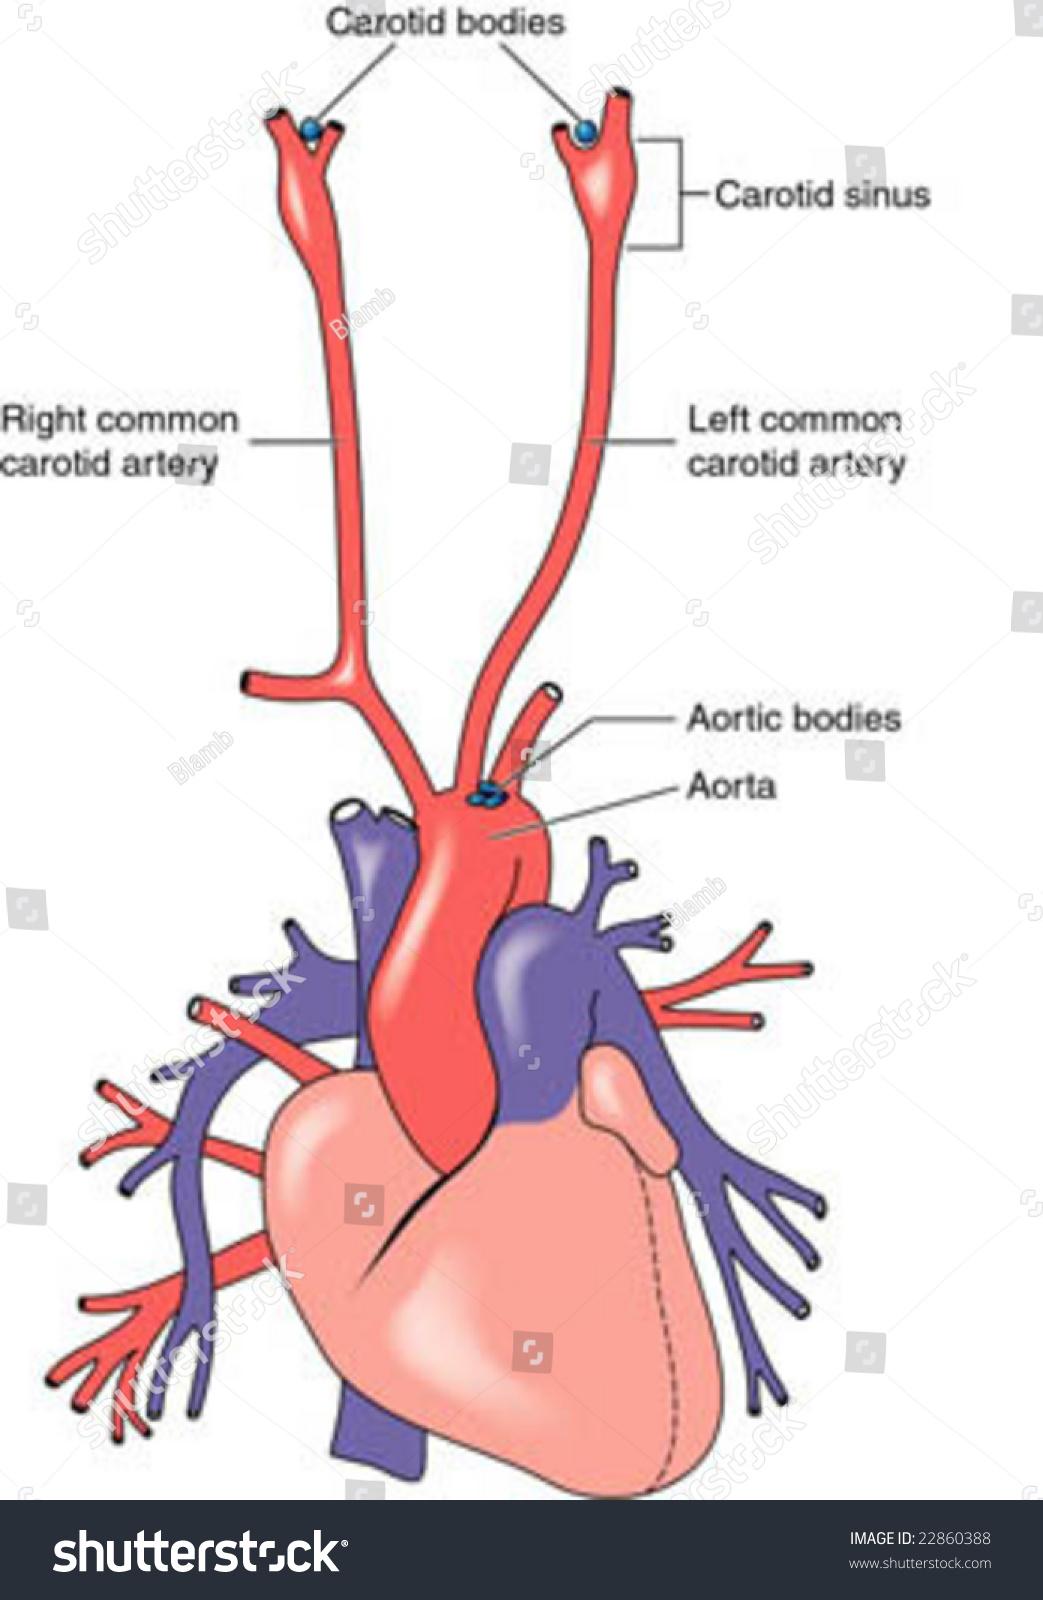 Carotid Aortic Bodies Stock Vector 22860388 - Shutterstock